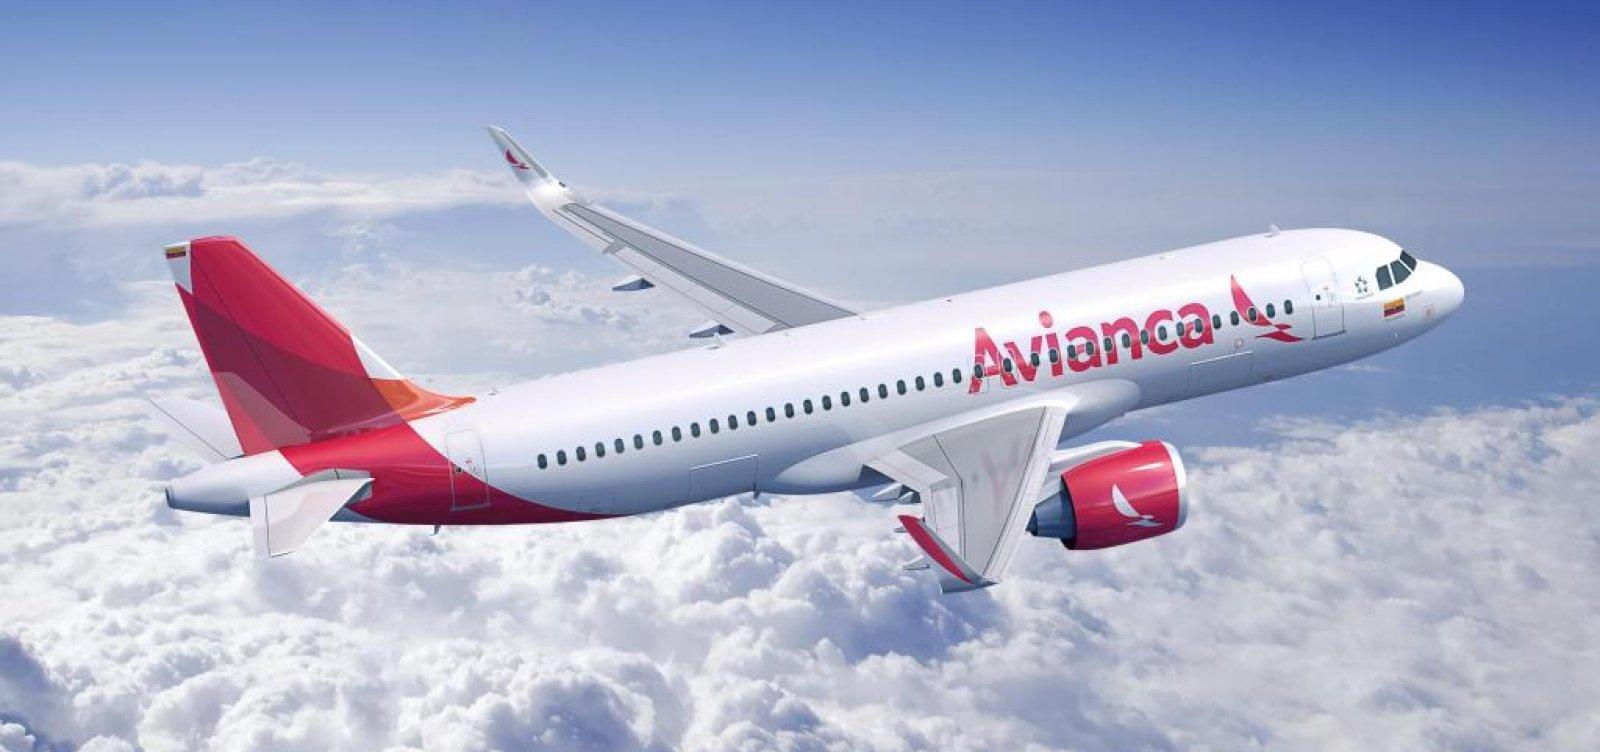 Avianca paga tarifas no Aeroporto de Salvador até quinta